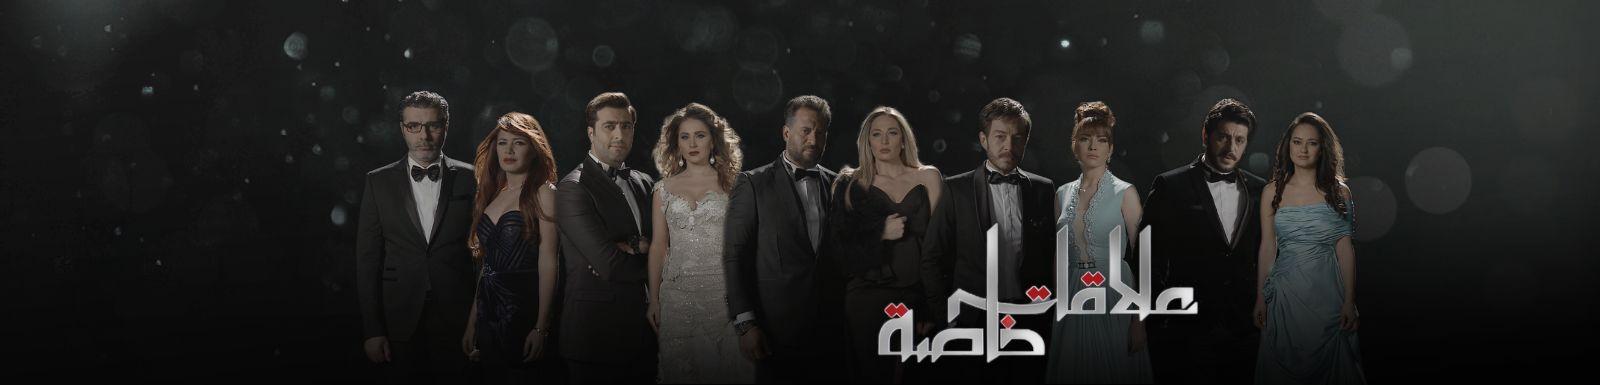 ����� ����� ������ ���� ������ 29 MBC shahid ���� ��